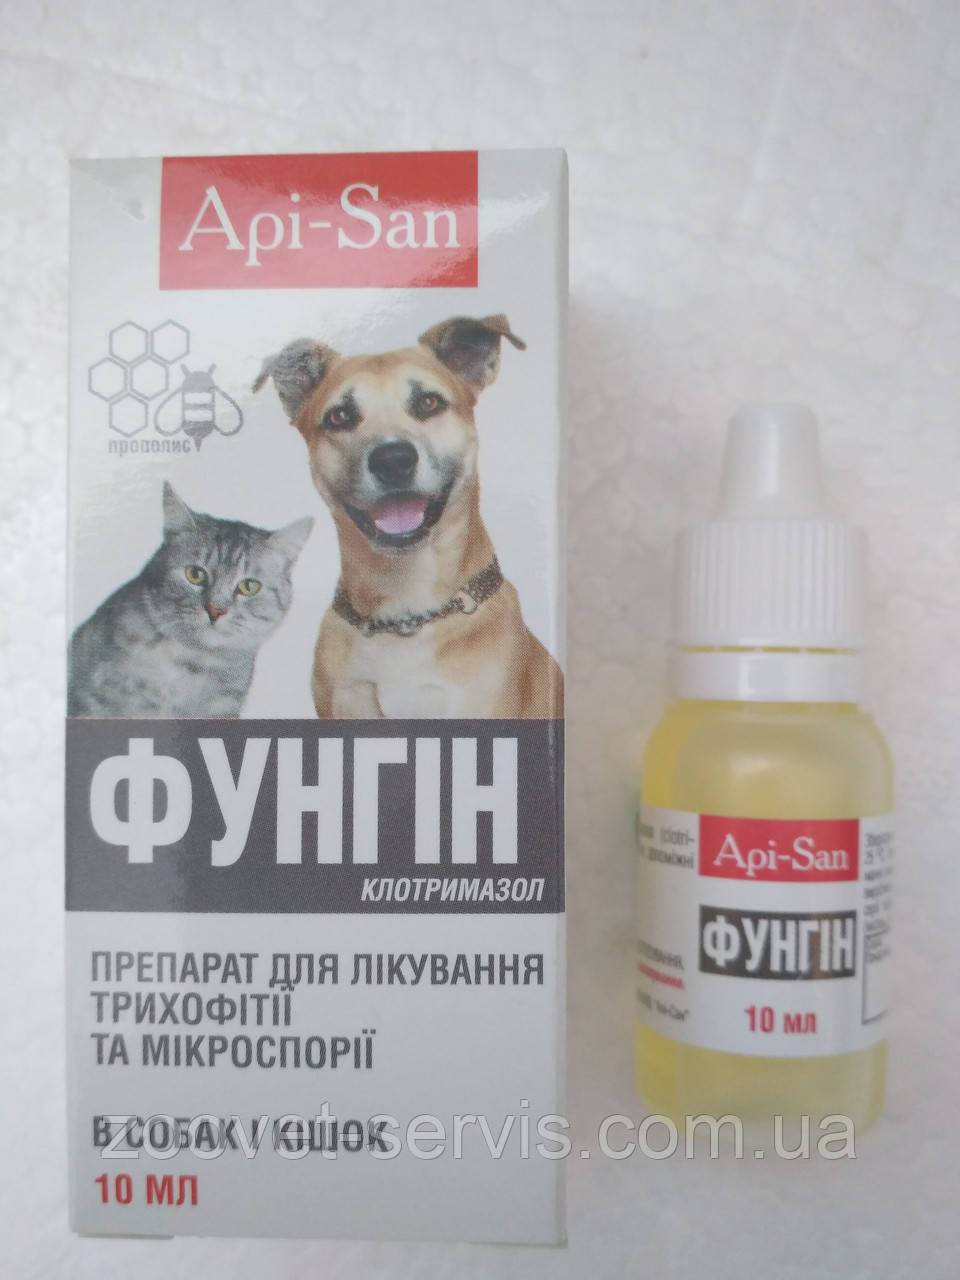 ФУНГИН для лечения трихофитии у кошек, флакон - 10 мл